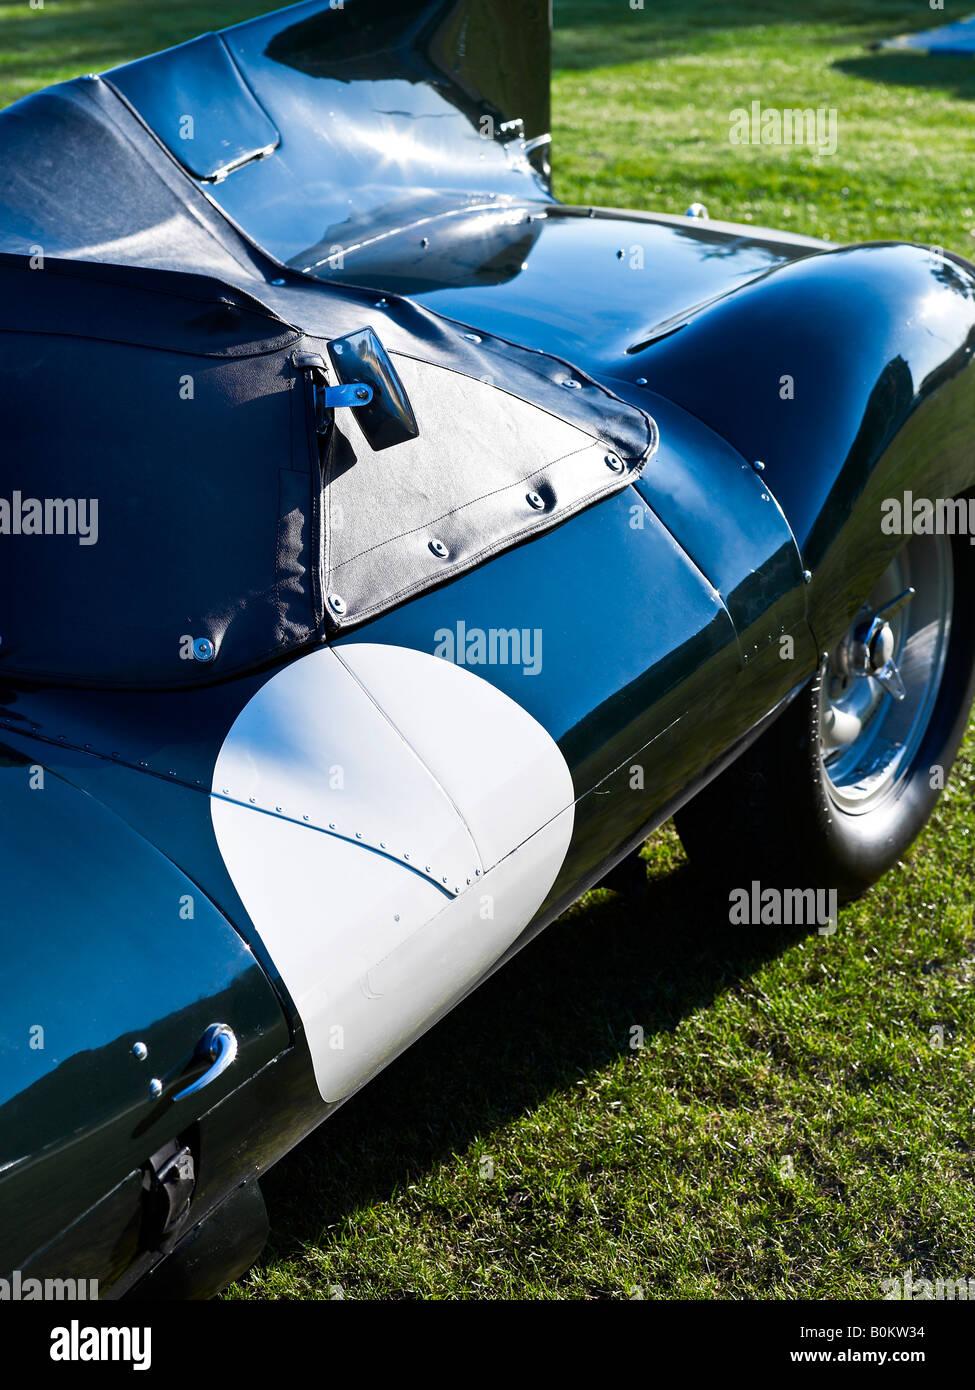 classic jaguar d type soft top convertible drophead formula one f1 racing car auto automobile - Stock Image